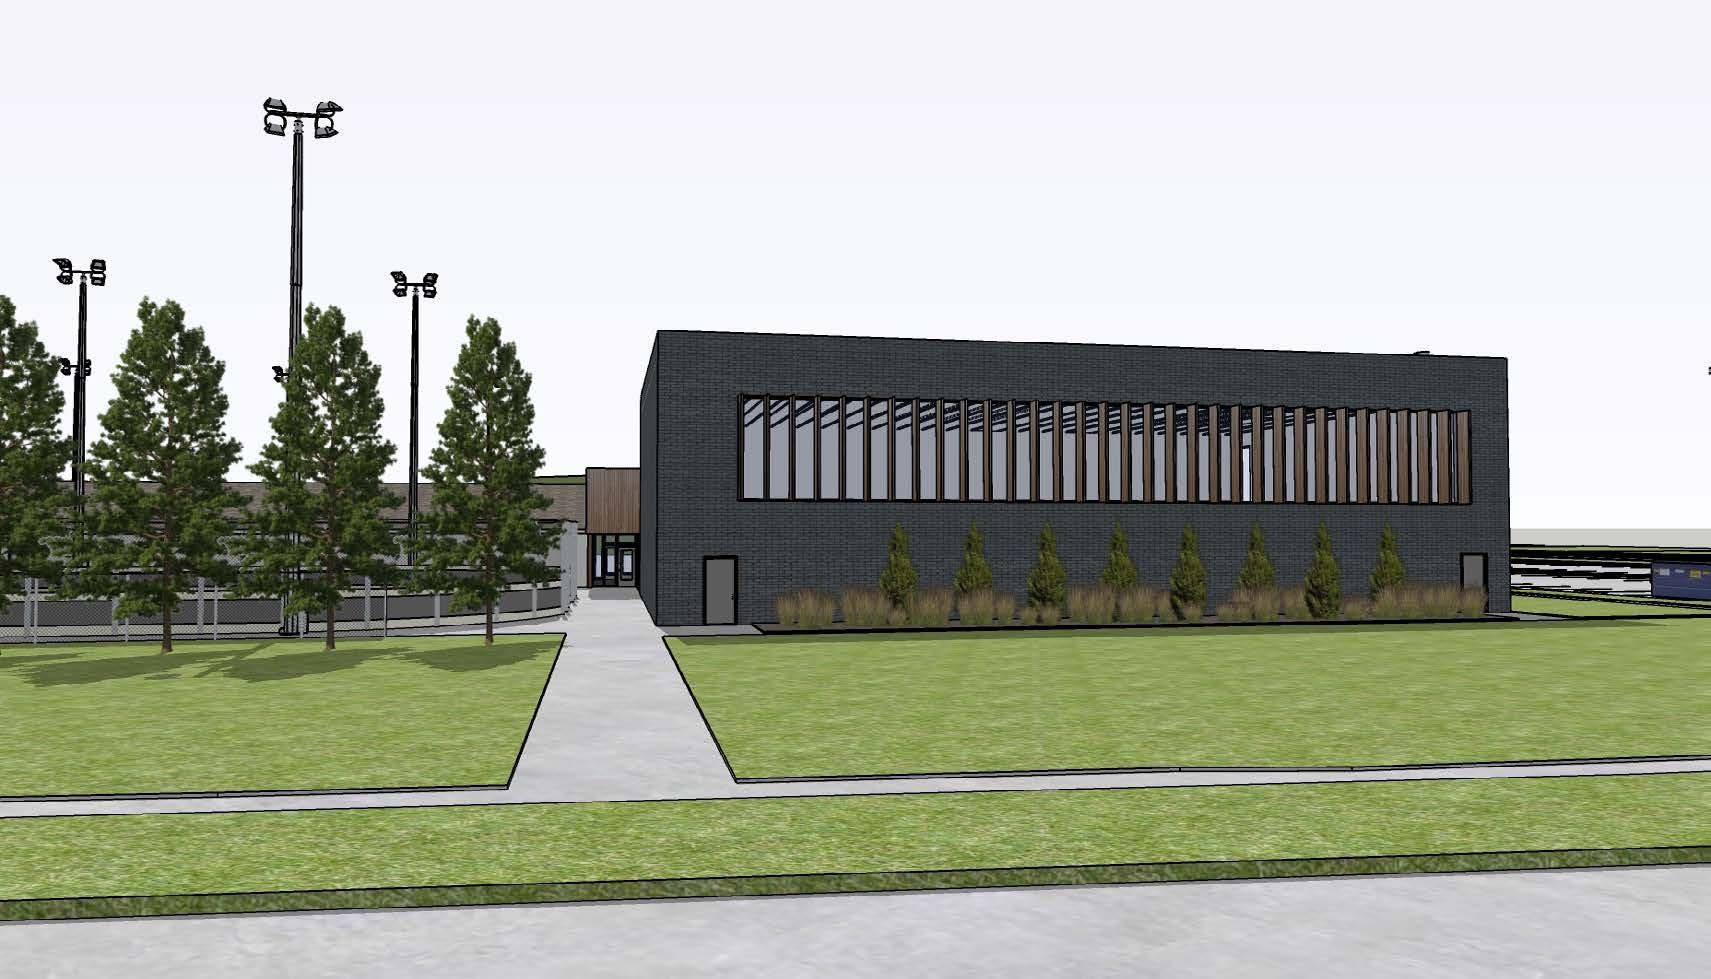 Tyndall Park Community Centre Rendering #4